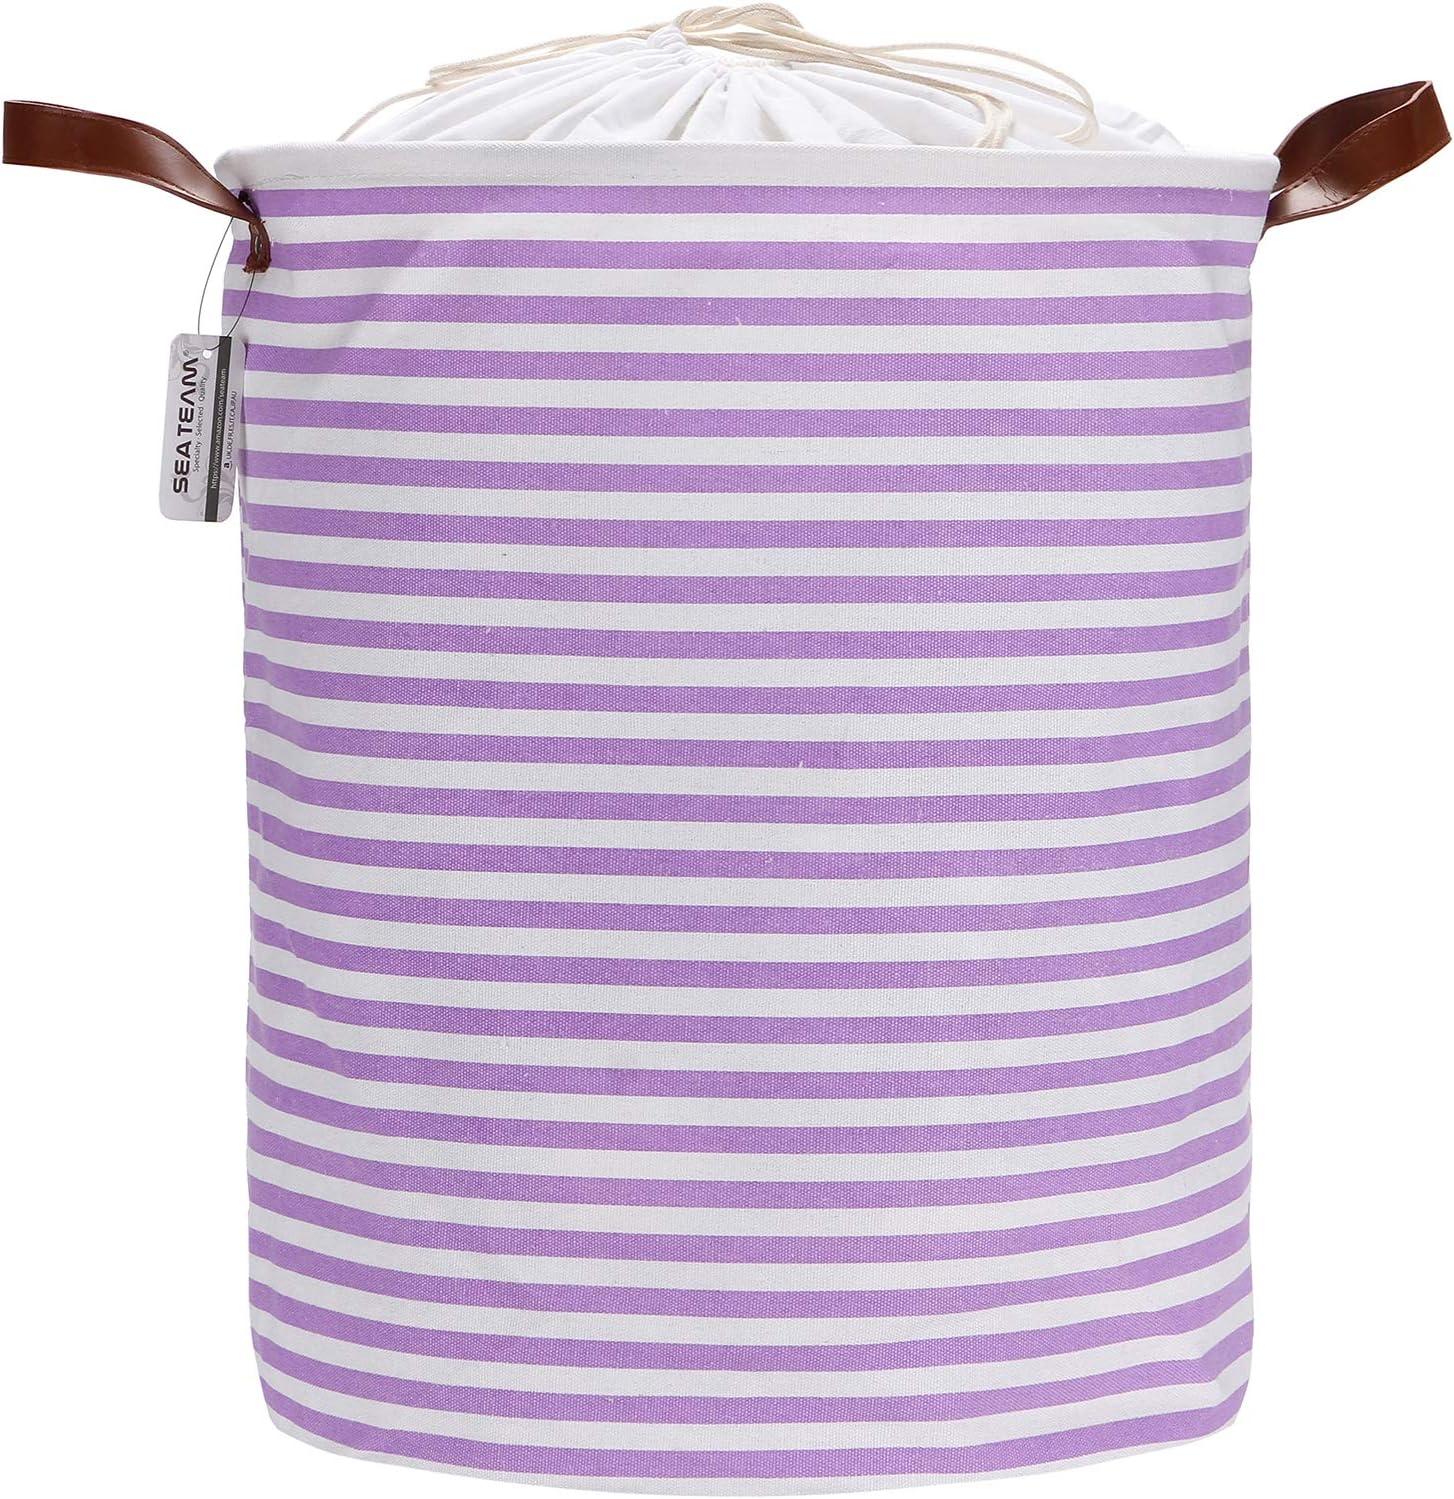 Sea Team 19.7 Inches Large Sized Waterproof Coating Ramie Cotton Fabric Folding Laundry Hamper Bucket Cylindric Burlap Canvas Storage Basket with Stylish Purple & White Stripe Design